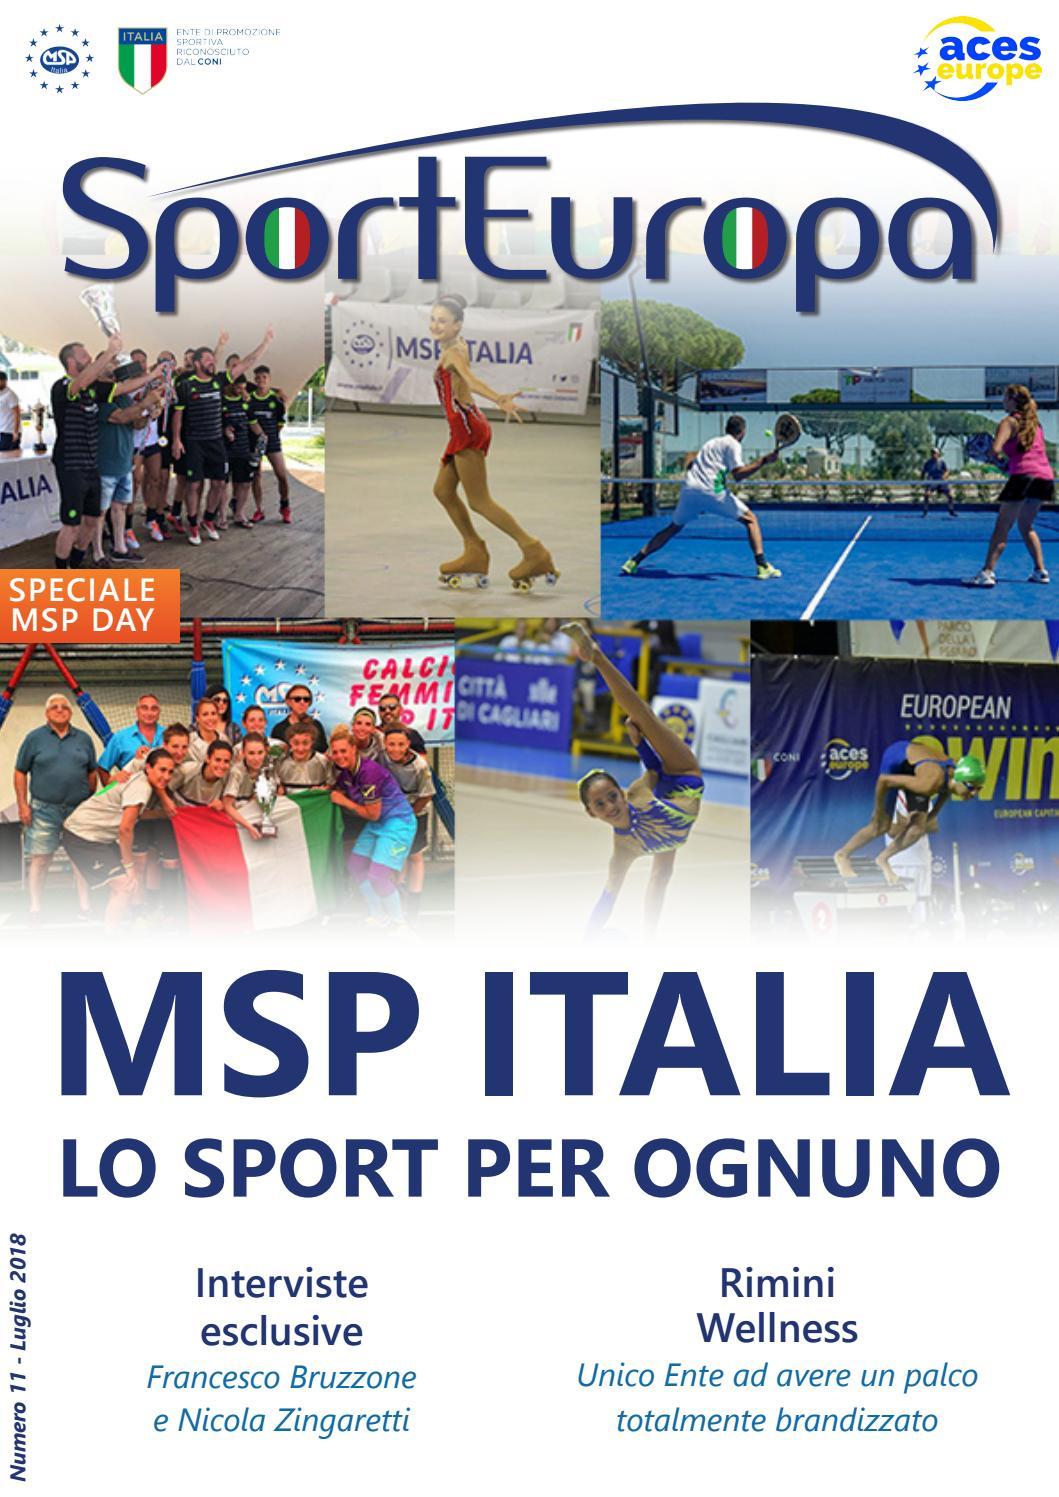 325d2d04a406 Sport Europa - luglio 2018 by Sport Europa - issuu